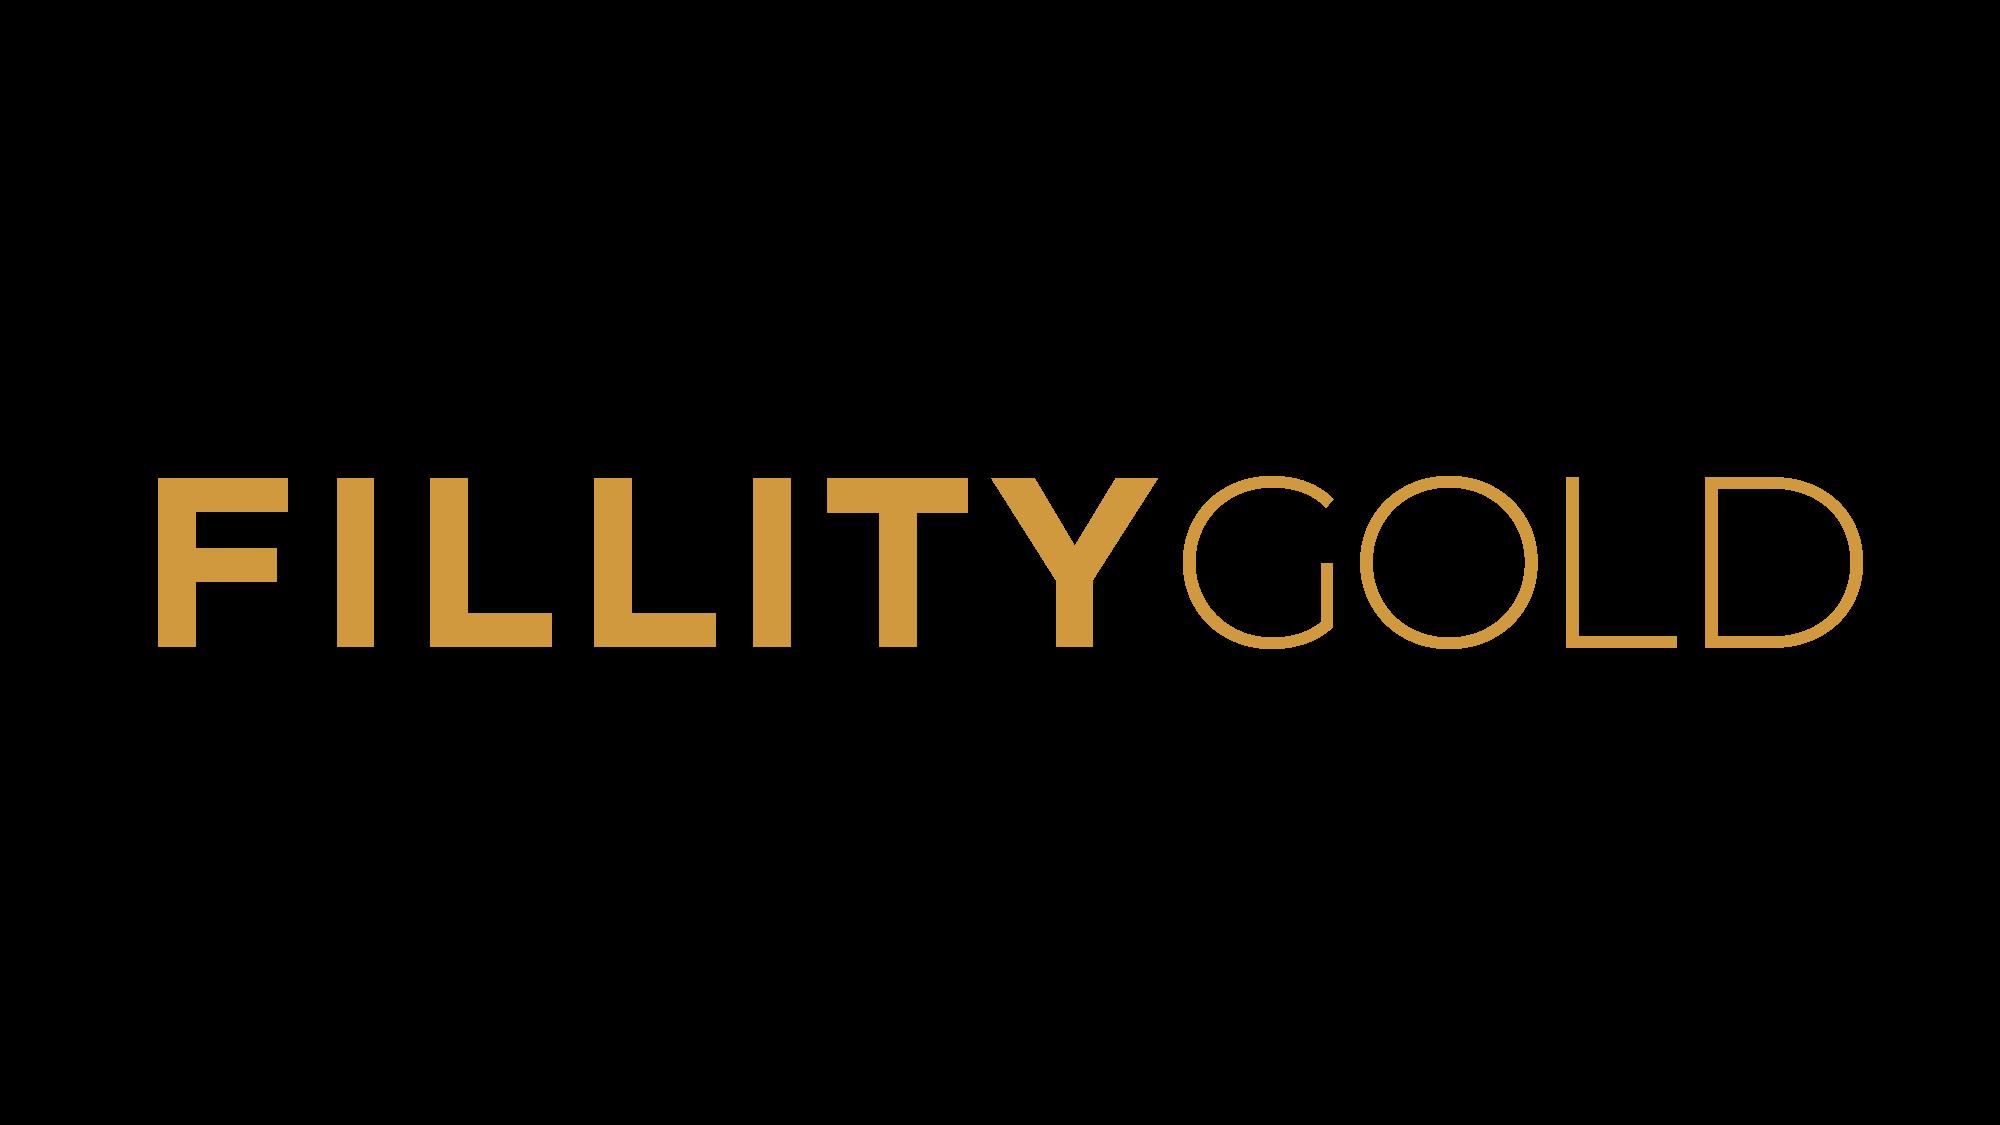 FY_GOLD_LOGO_OK